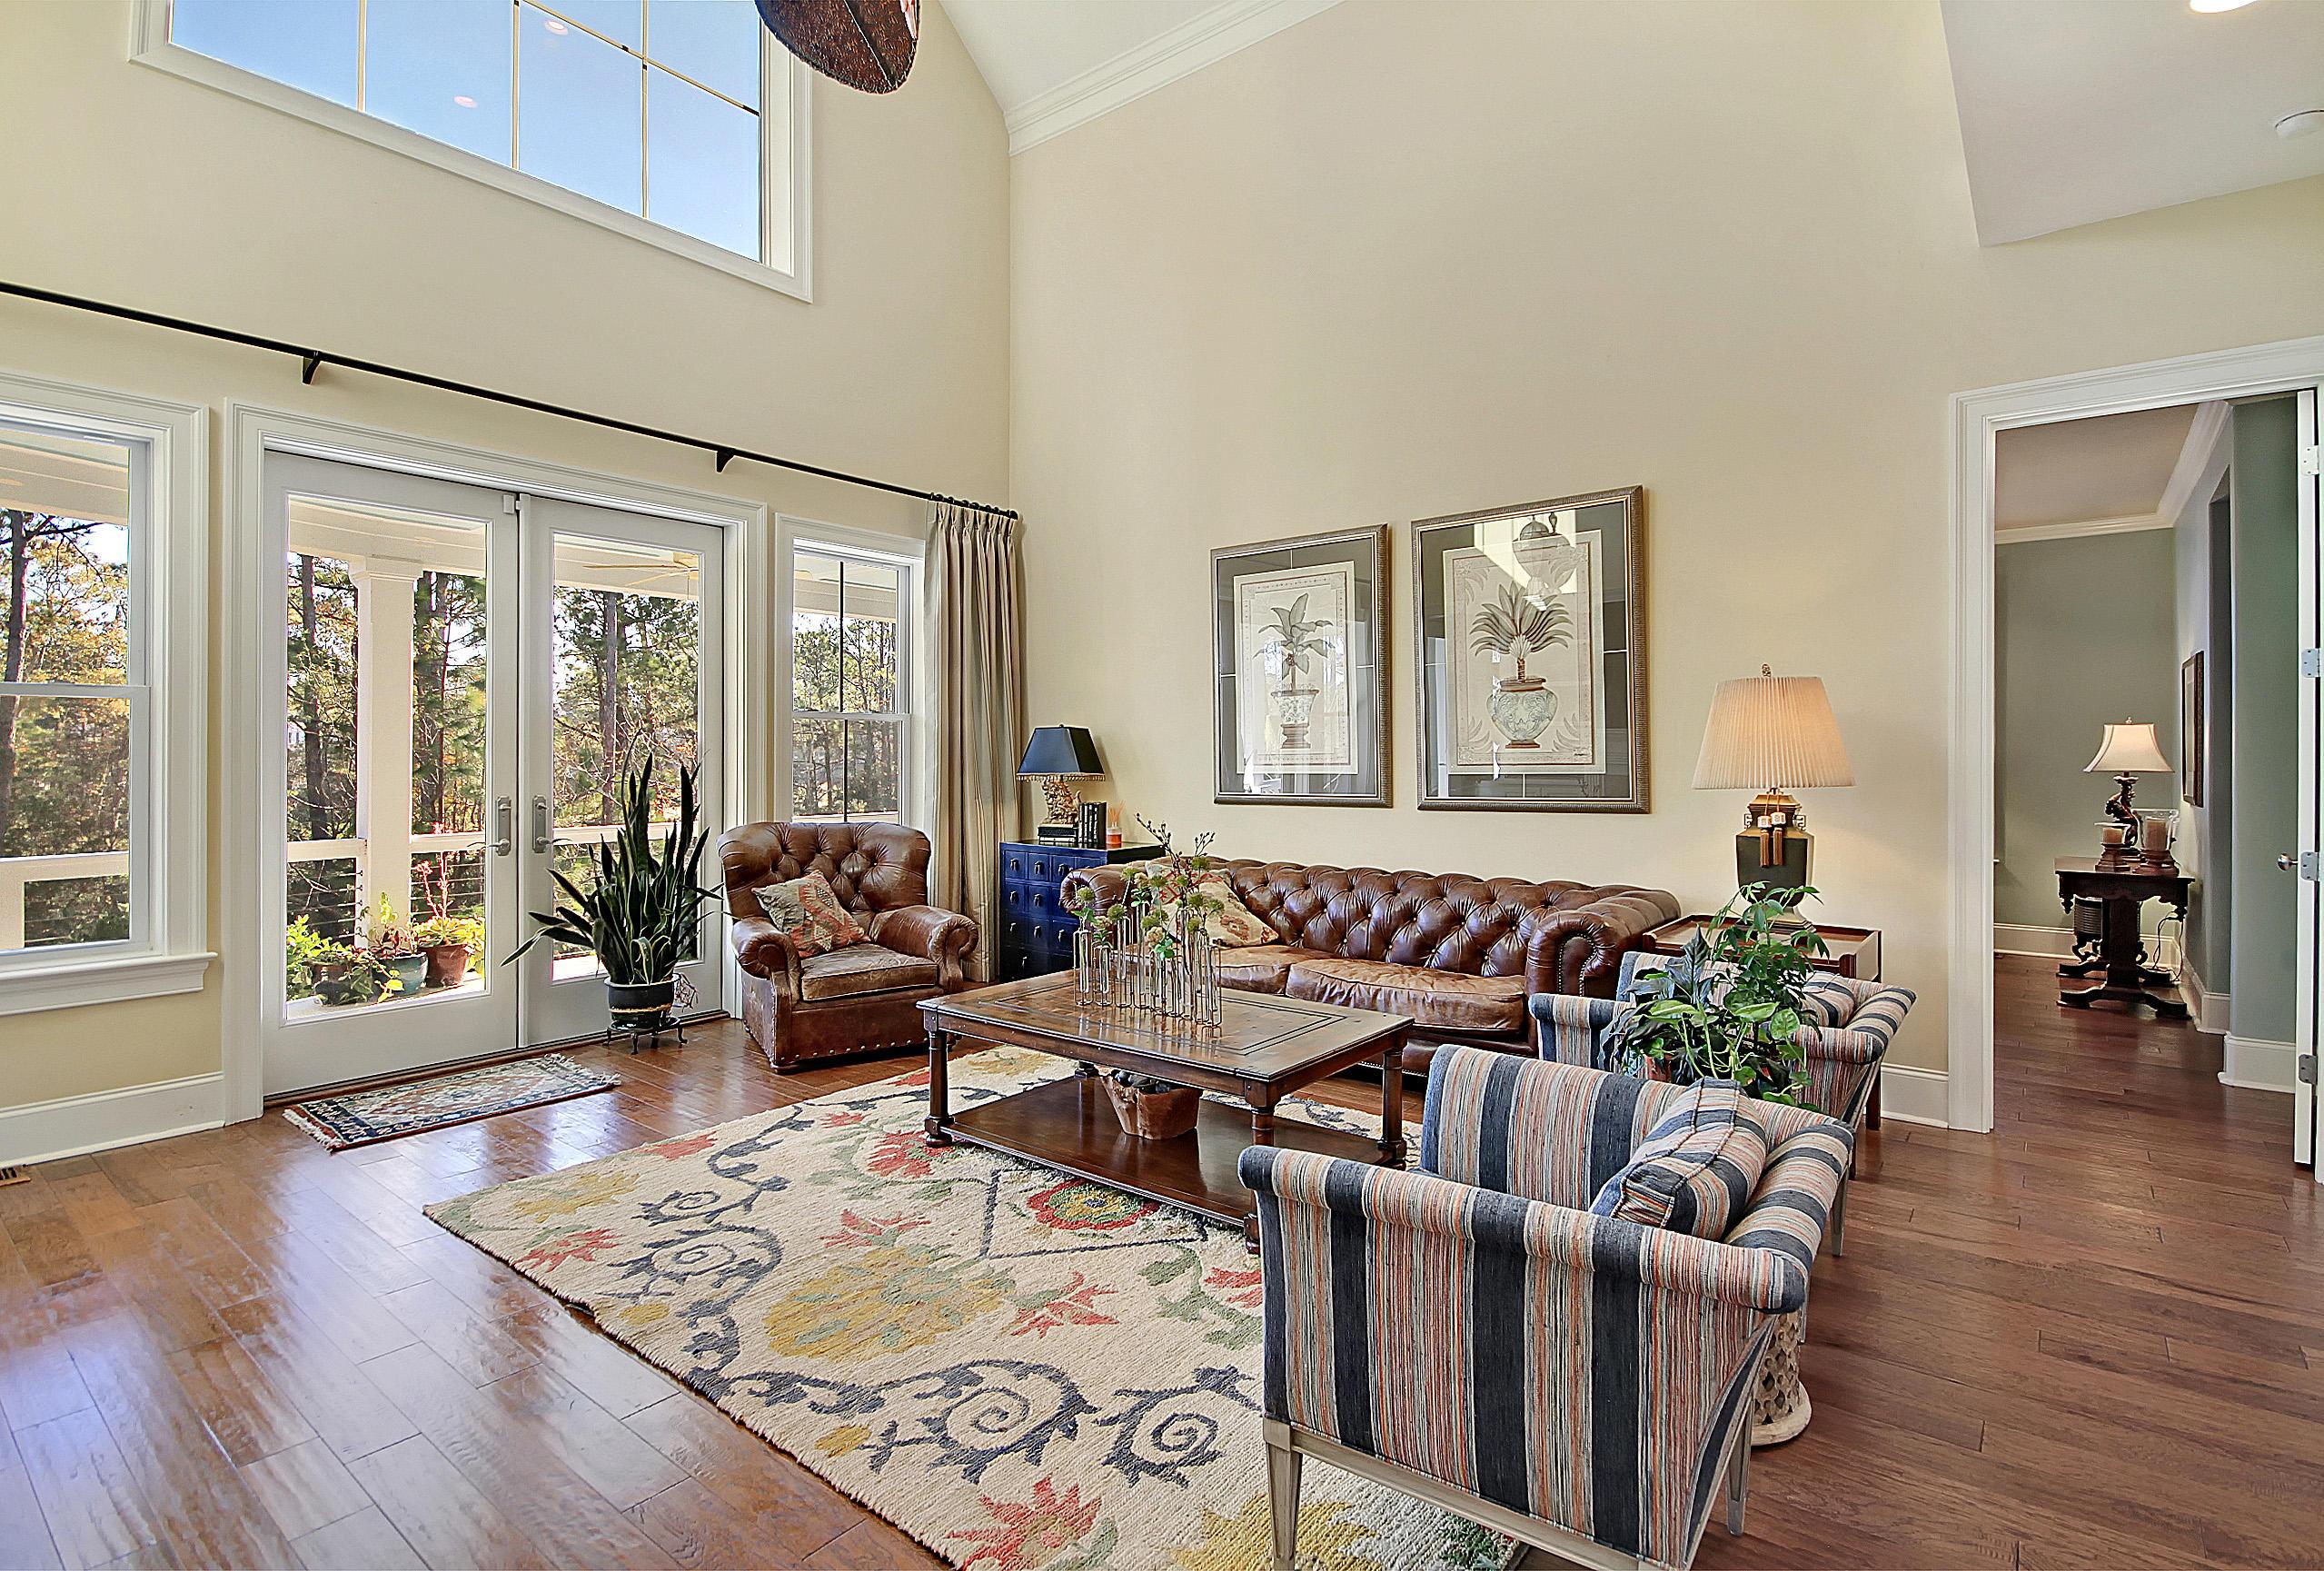 Rivertowne Country Club Homes For Sale - 2601 Kiln Creek, Mount Pleasant, SC - 25